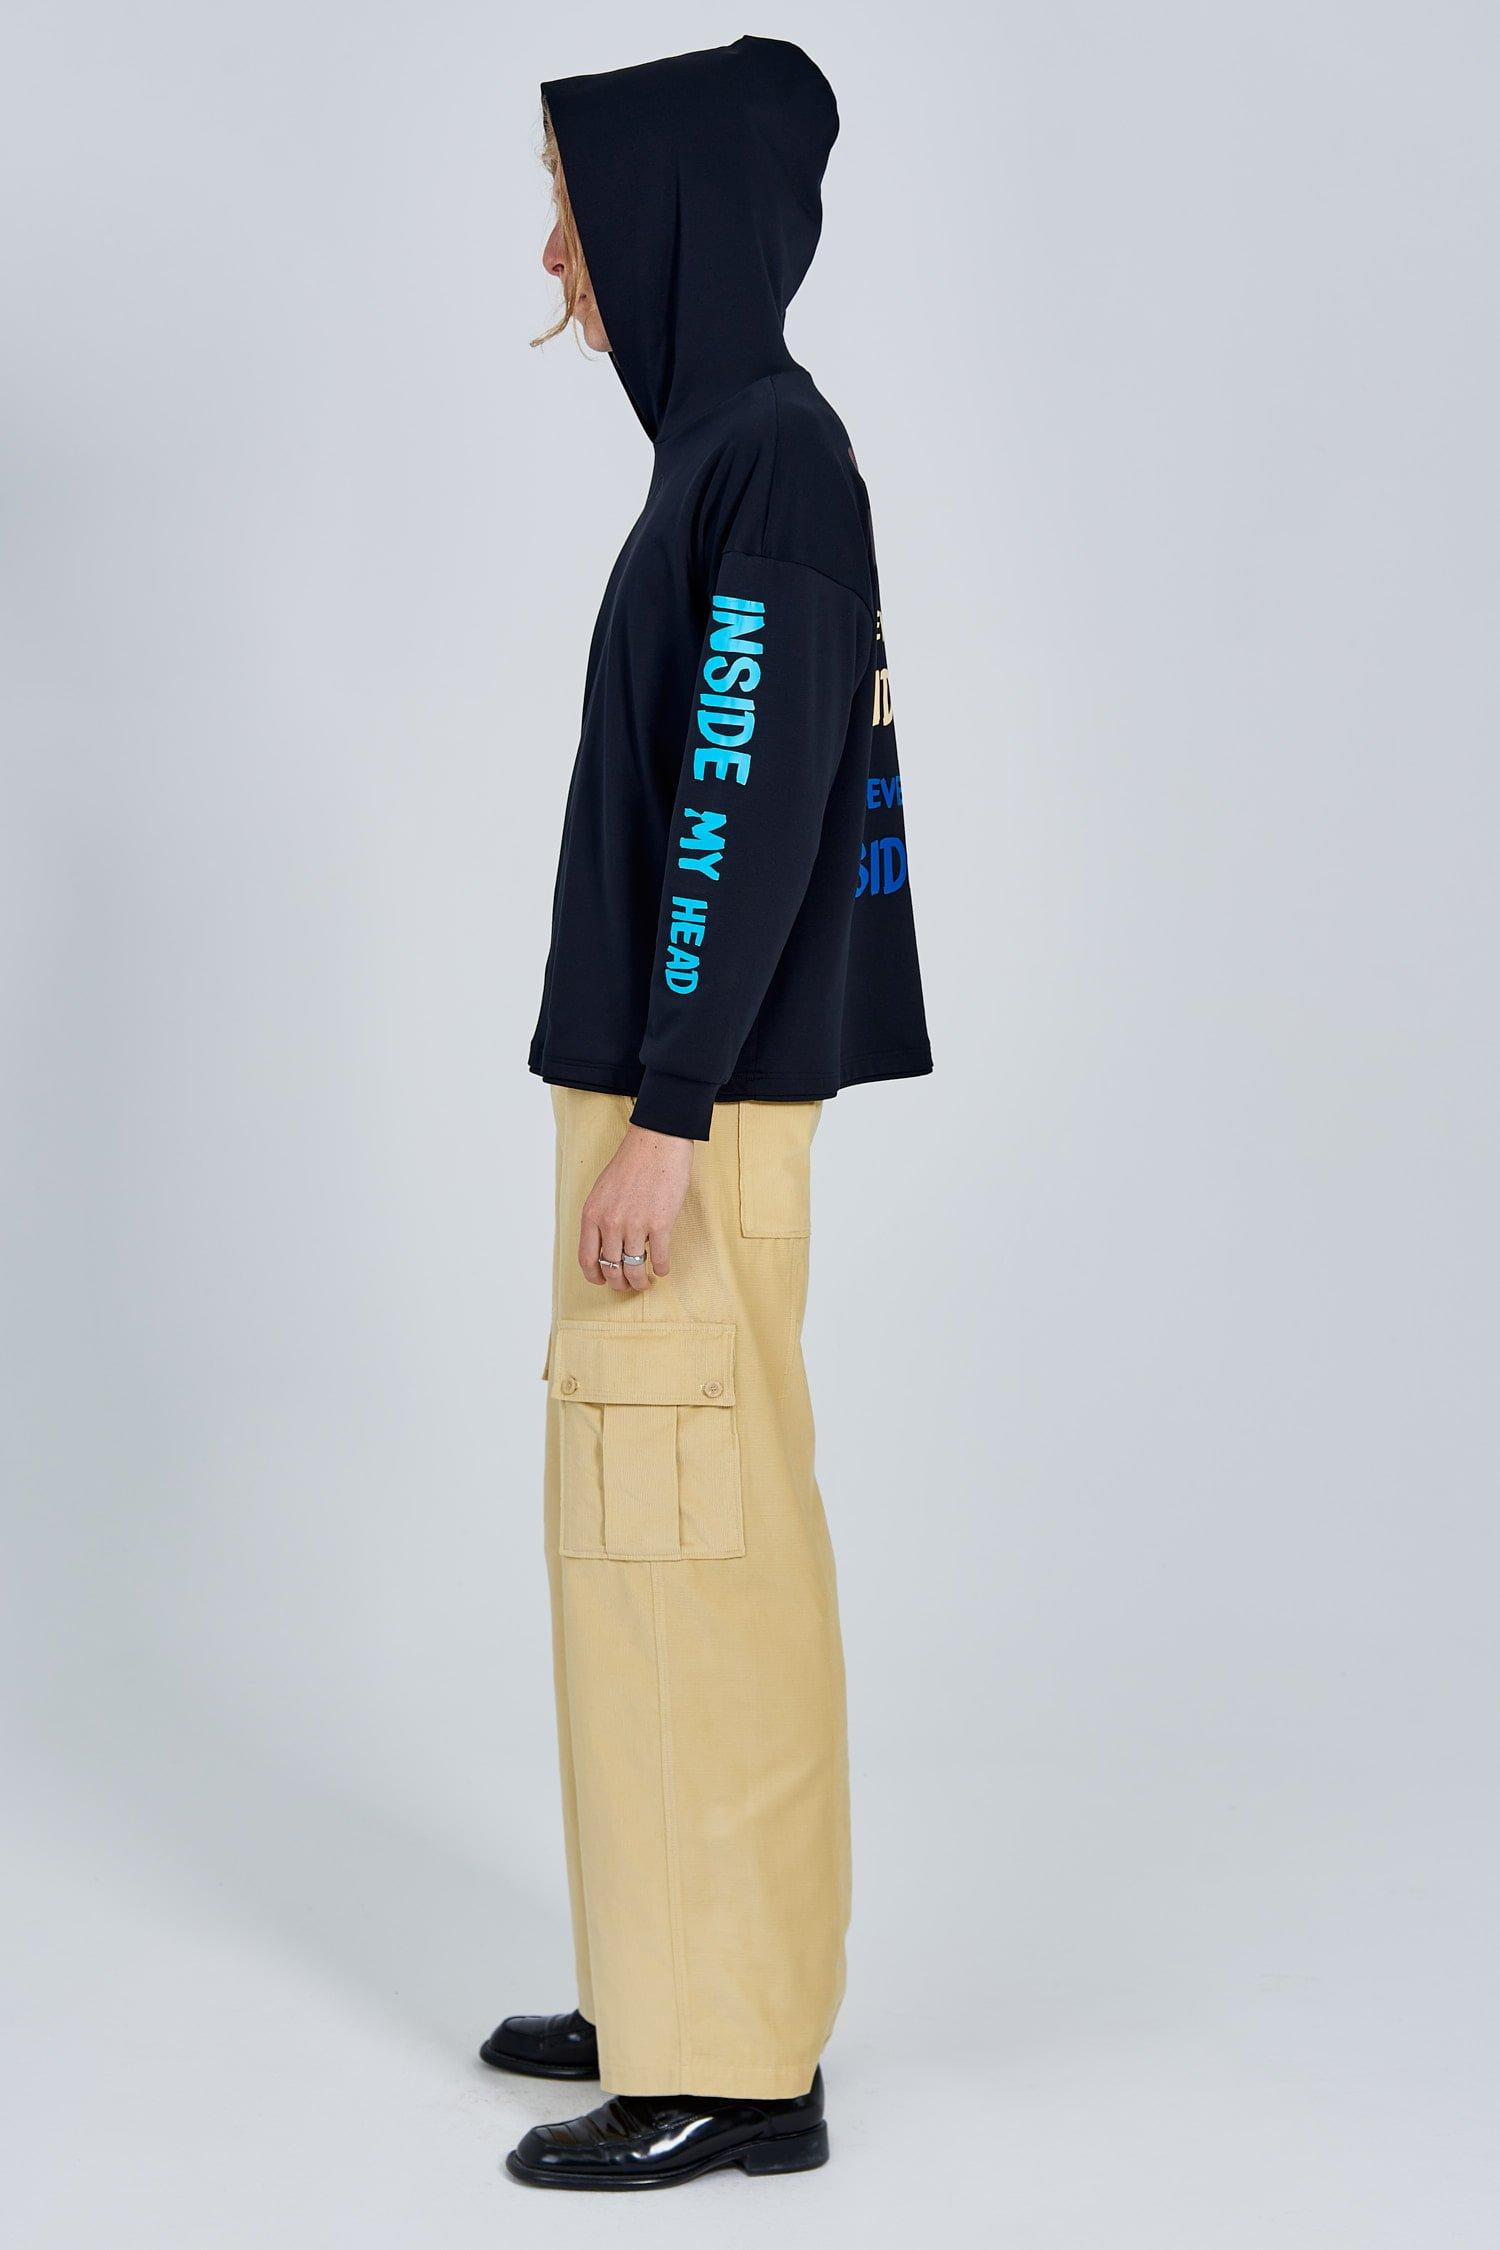 Acephala Fw 2020 21 Black Unisex Printed Hoody Yellow Corduroy Trousers Male Side Left